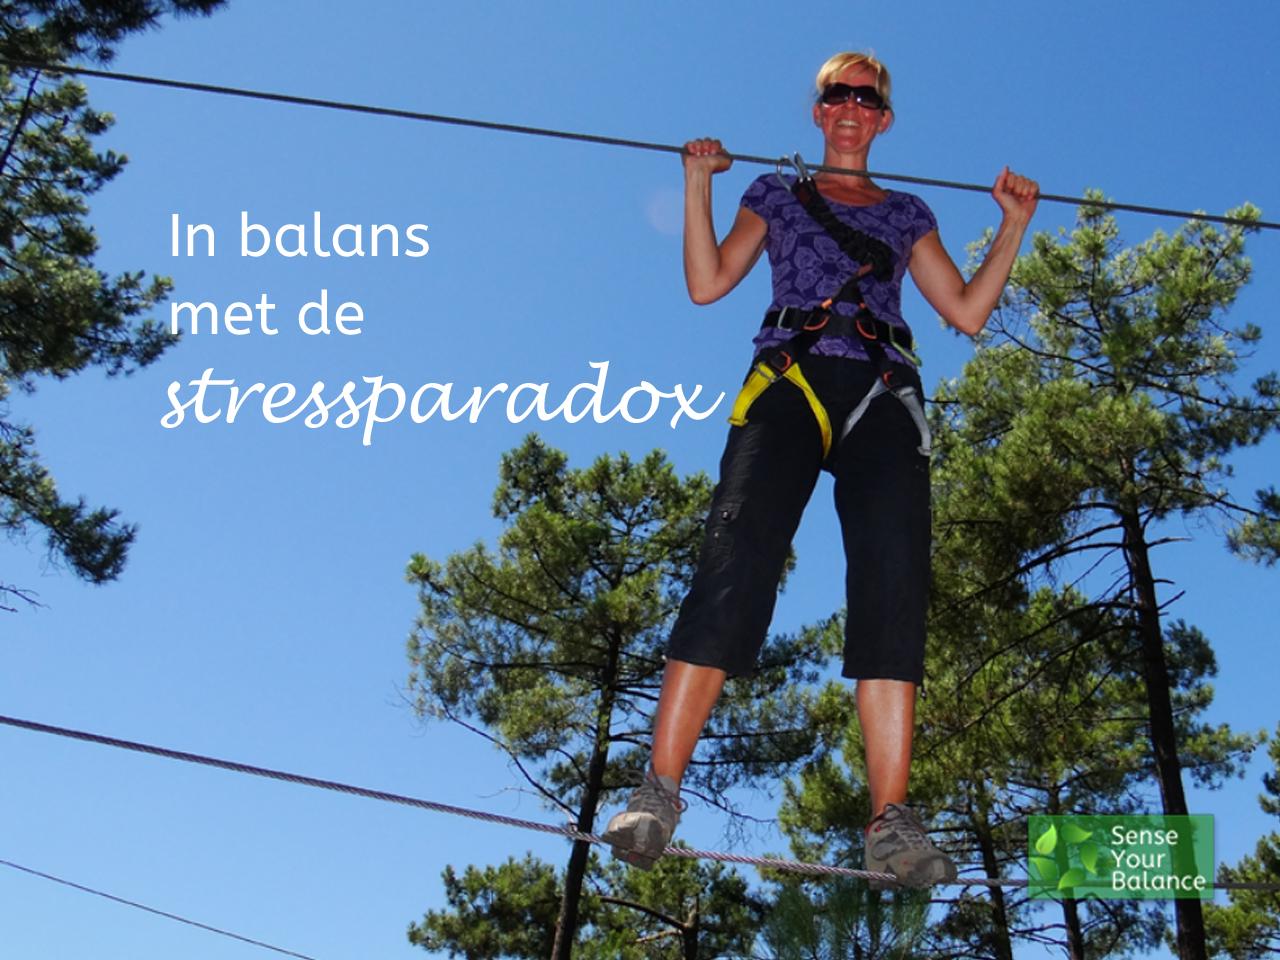 In balans met de stress paradox - Sense Your Balance - IJsselstein